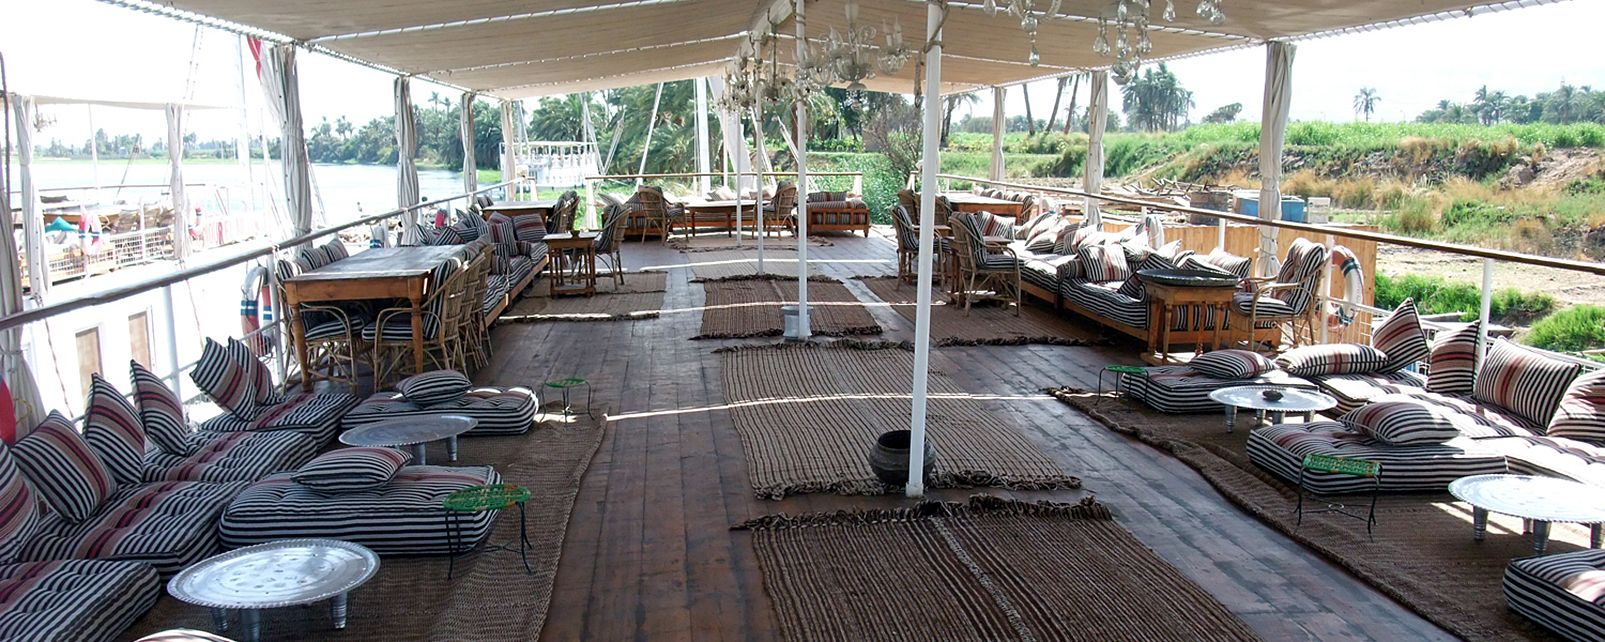 Hotel Ship Morway